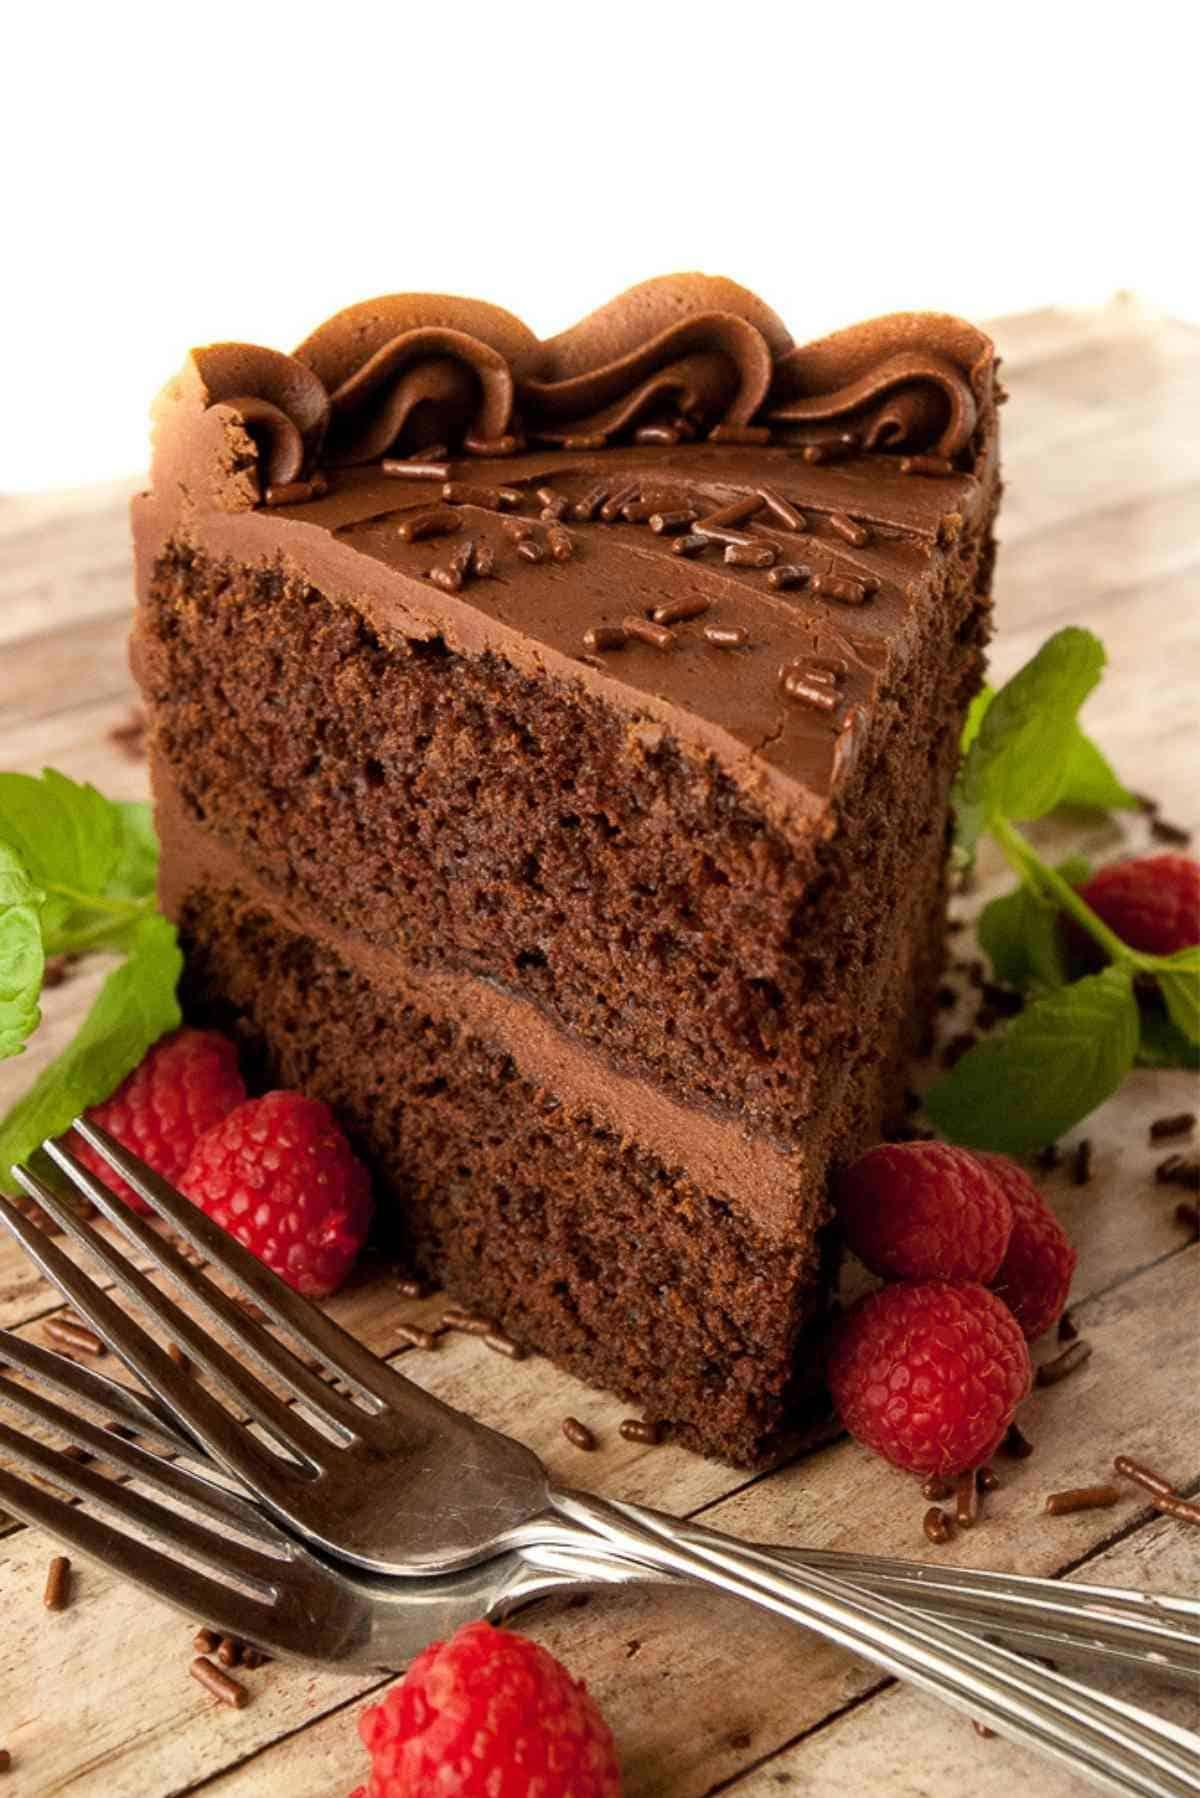 A big slice of chocolate cake garnished with mint and fresh raspberries.